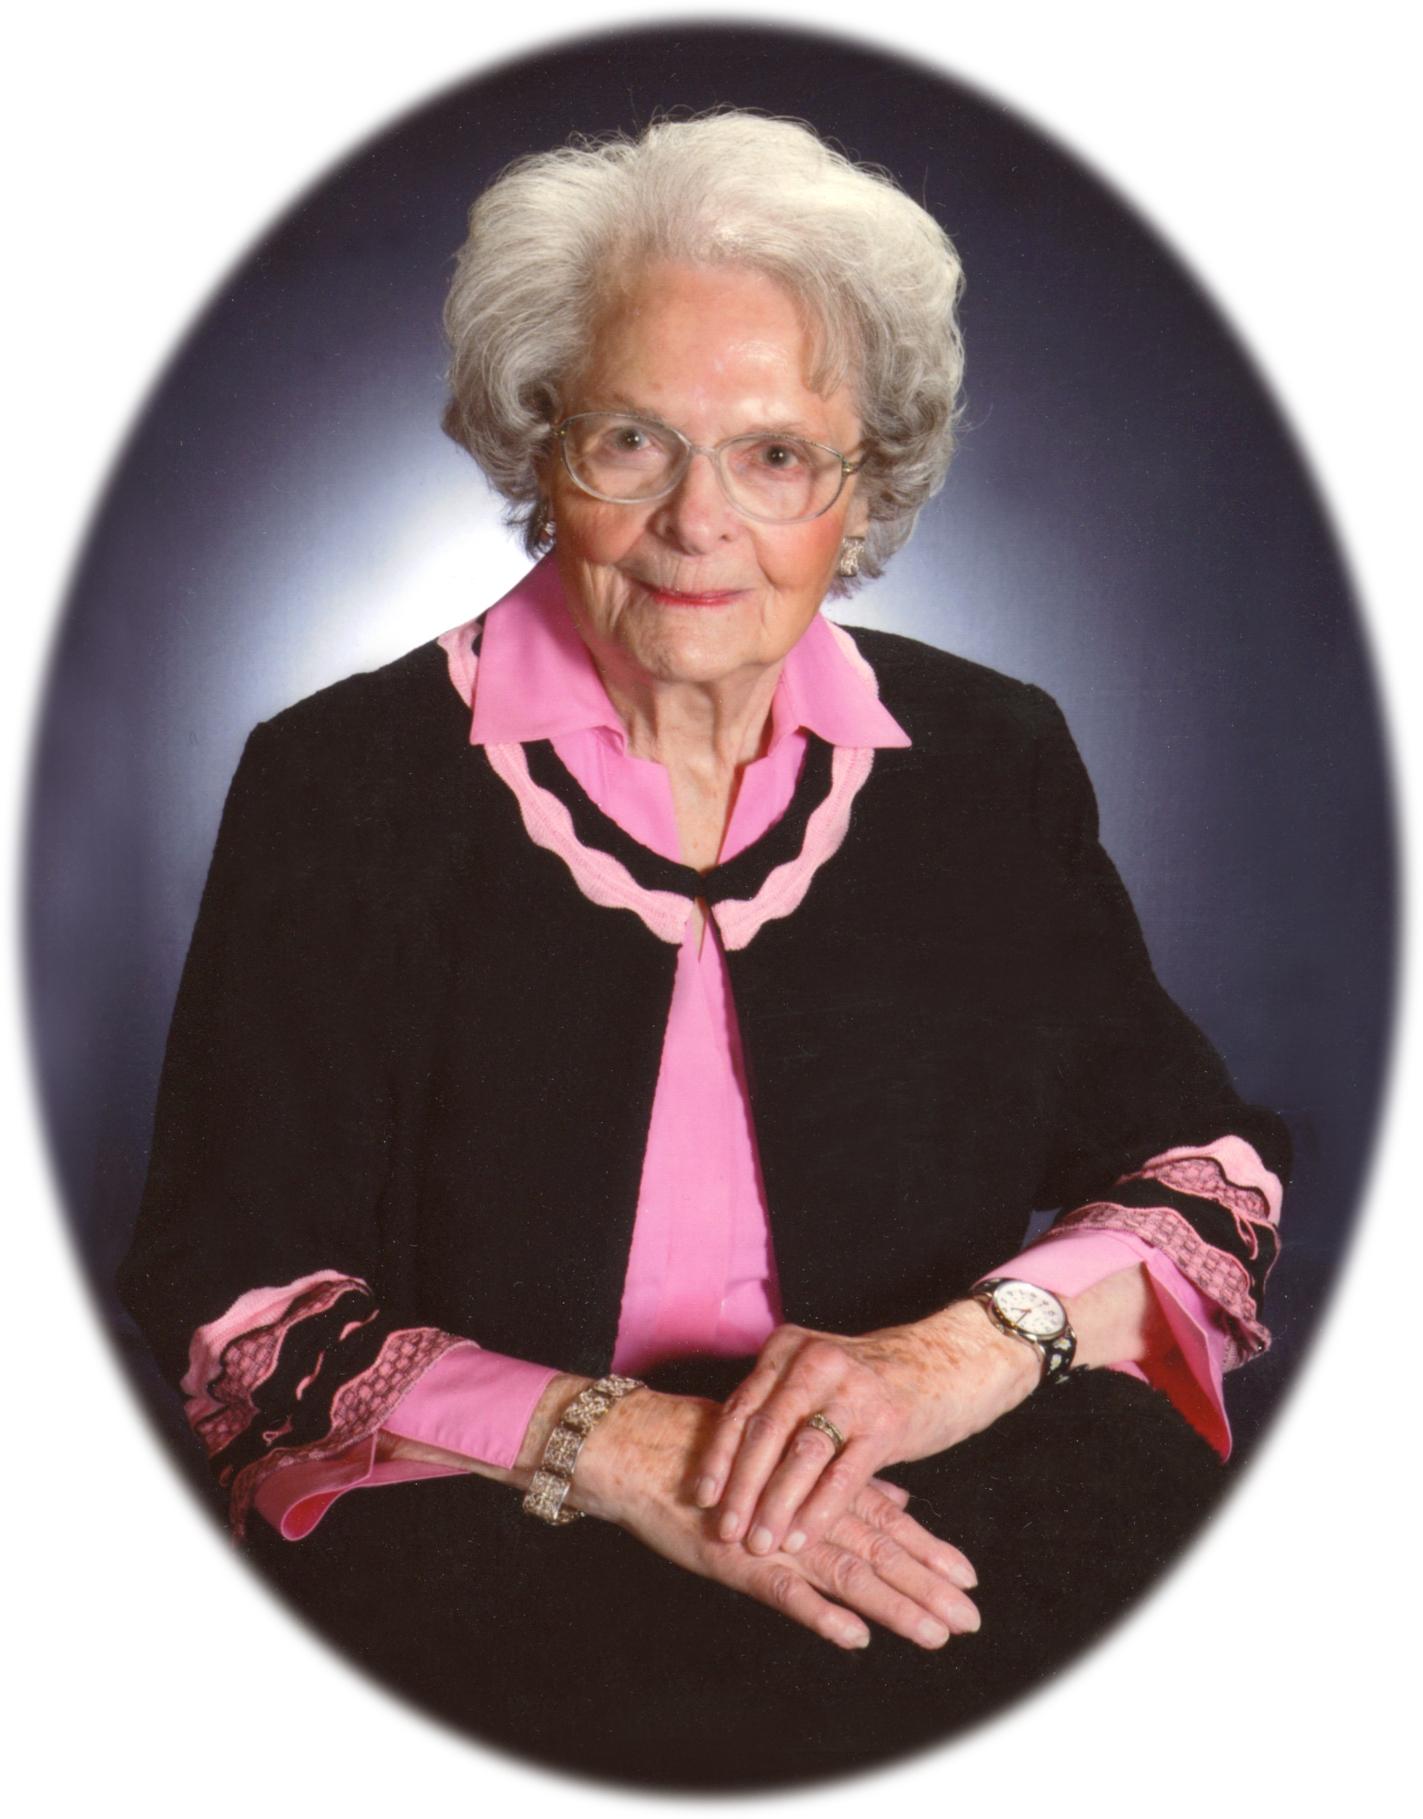 Patricia N. Swanson